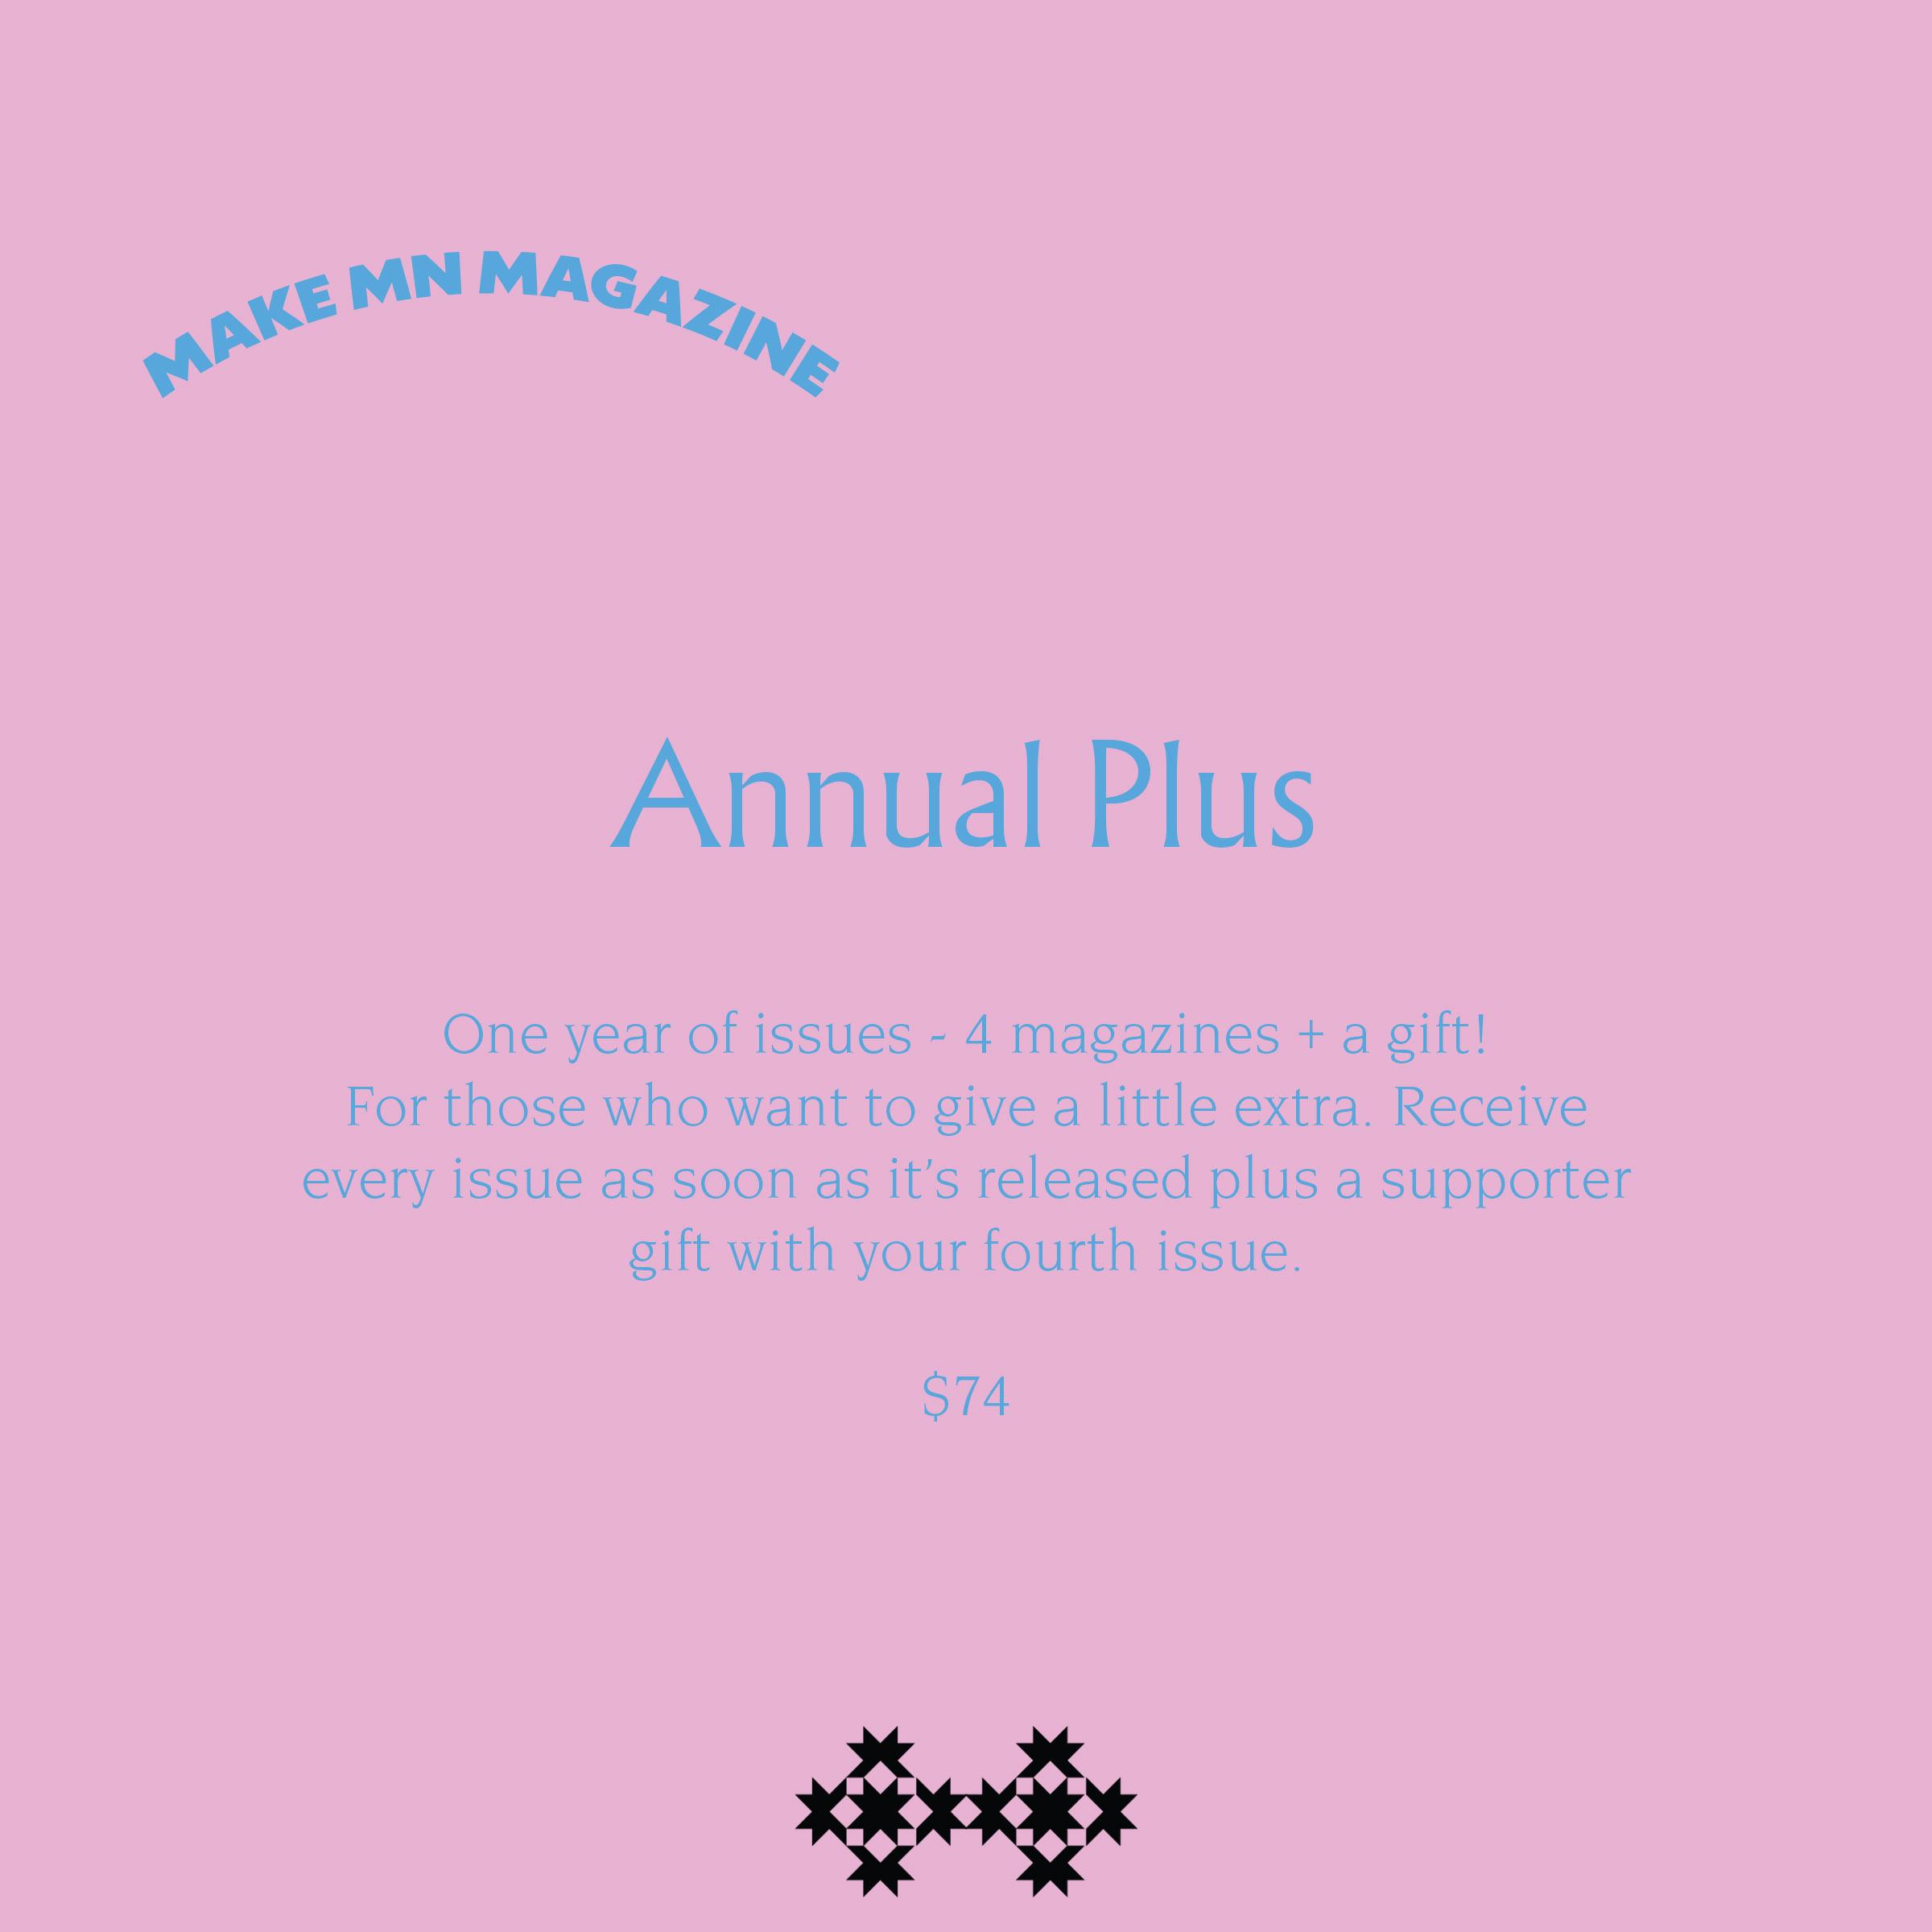 Annual Plus Subscription